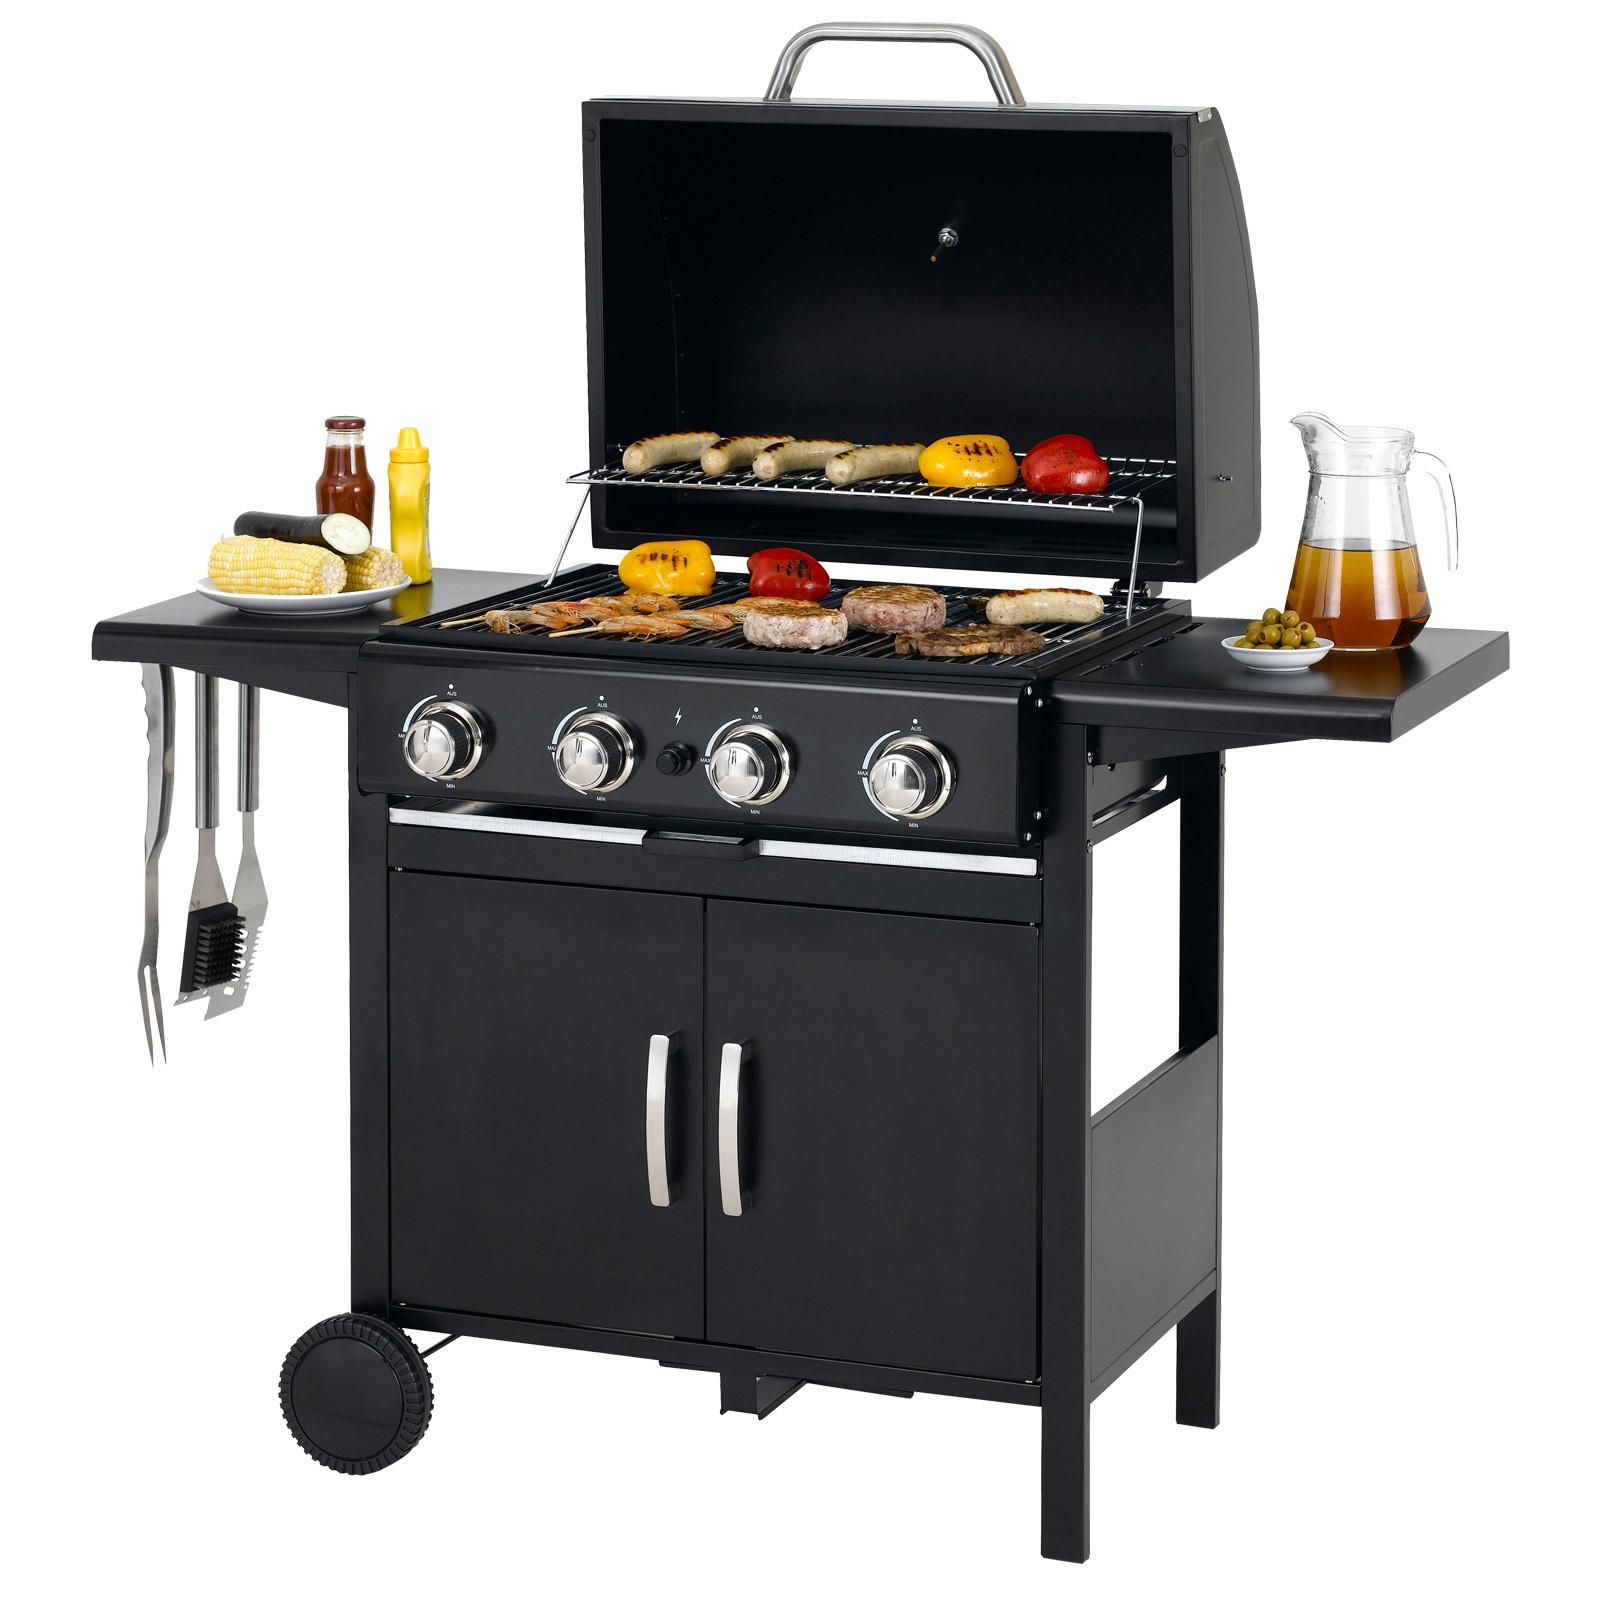 tepro gasgrill bbq grill grillwagen campinggrill barbecue. Black Bedroom Furniture Sets. Home Design Ideas